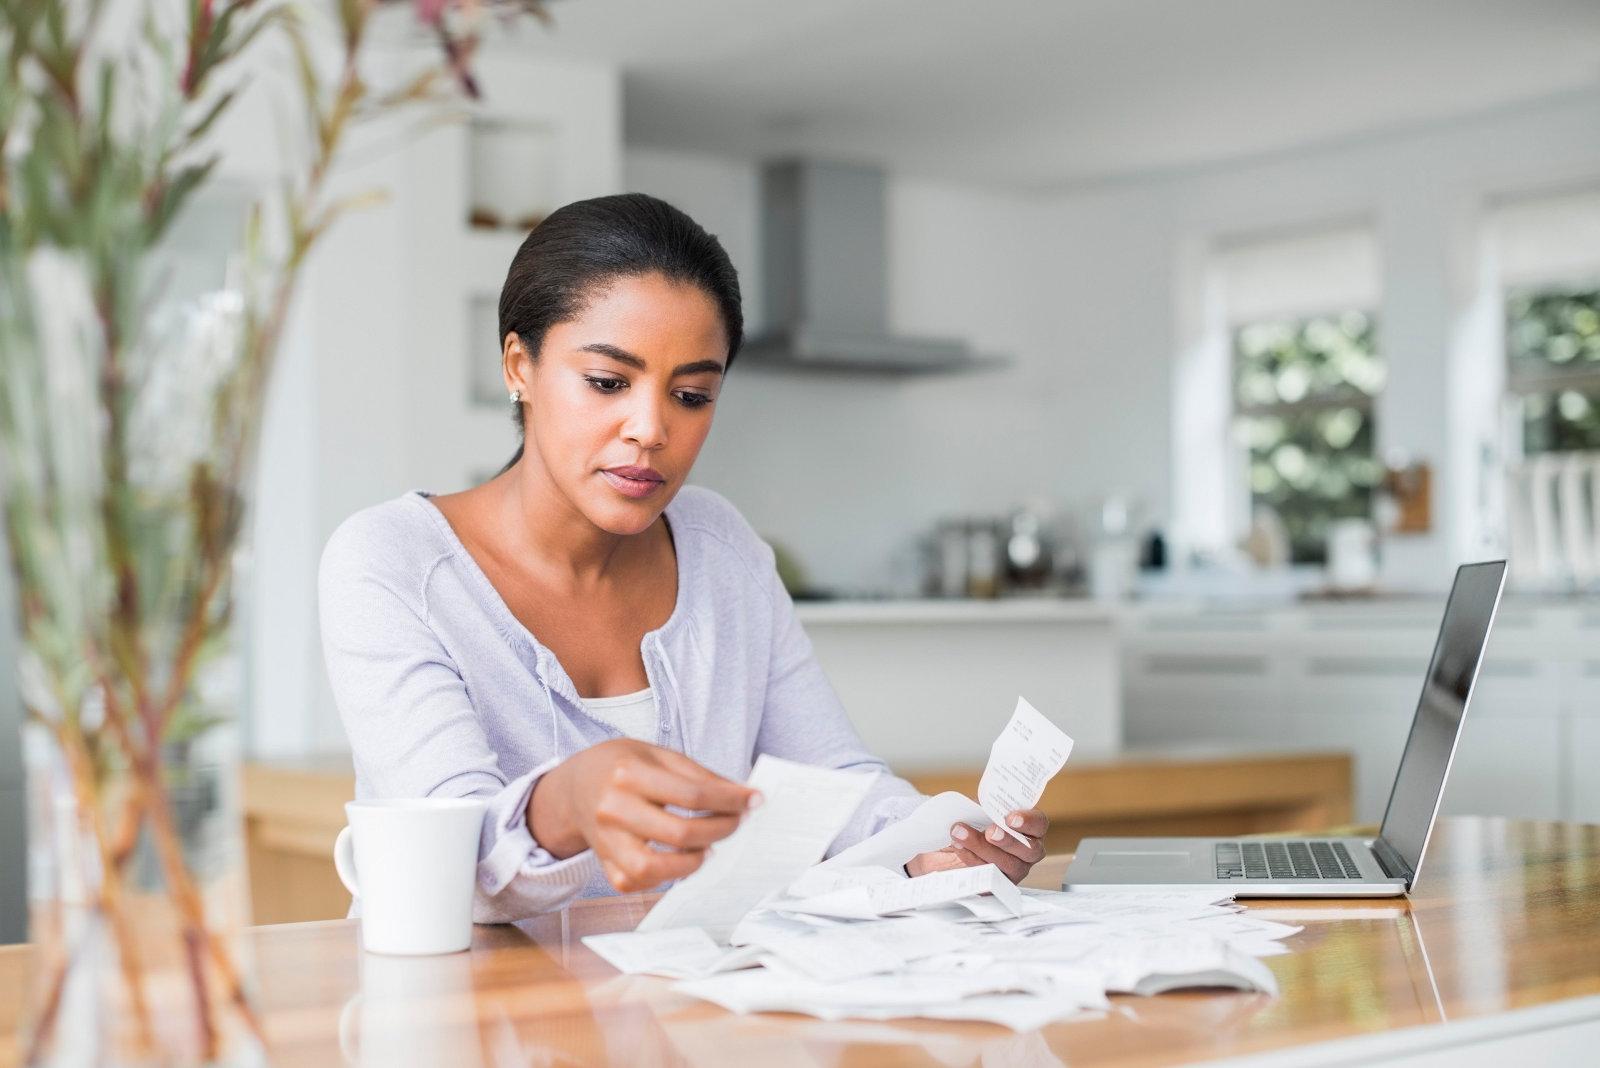 trekk refinansiering gebyr skattemelding